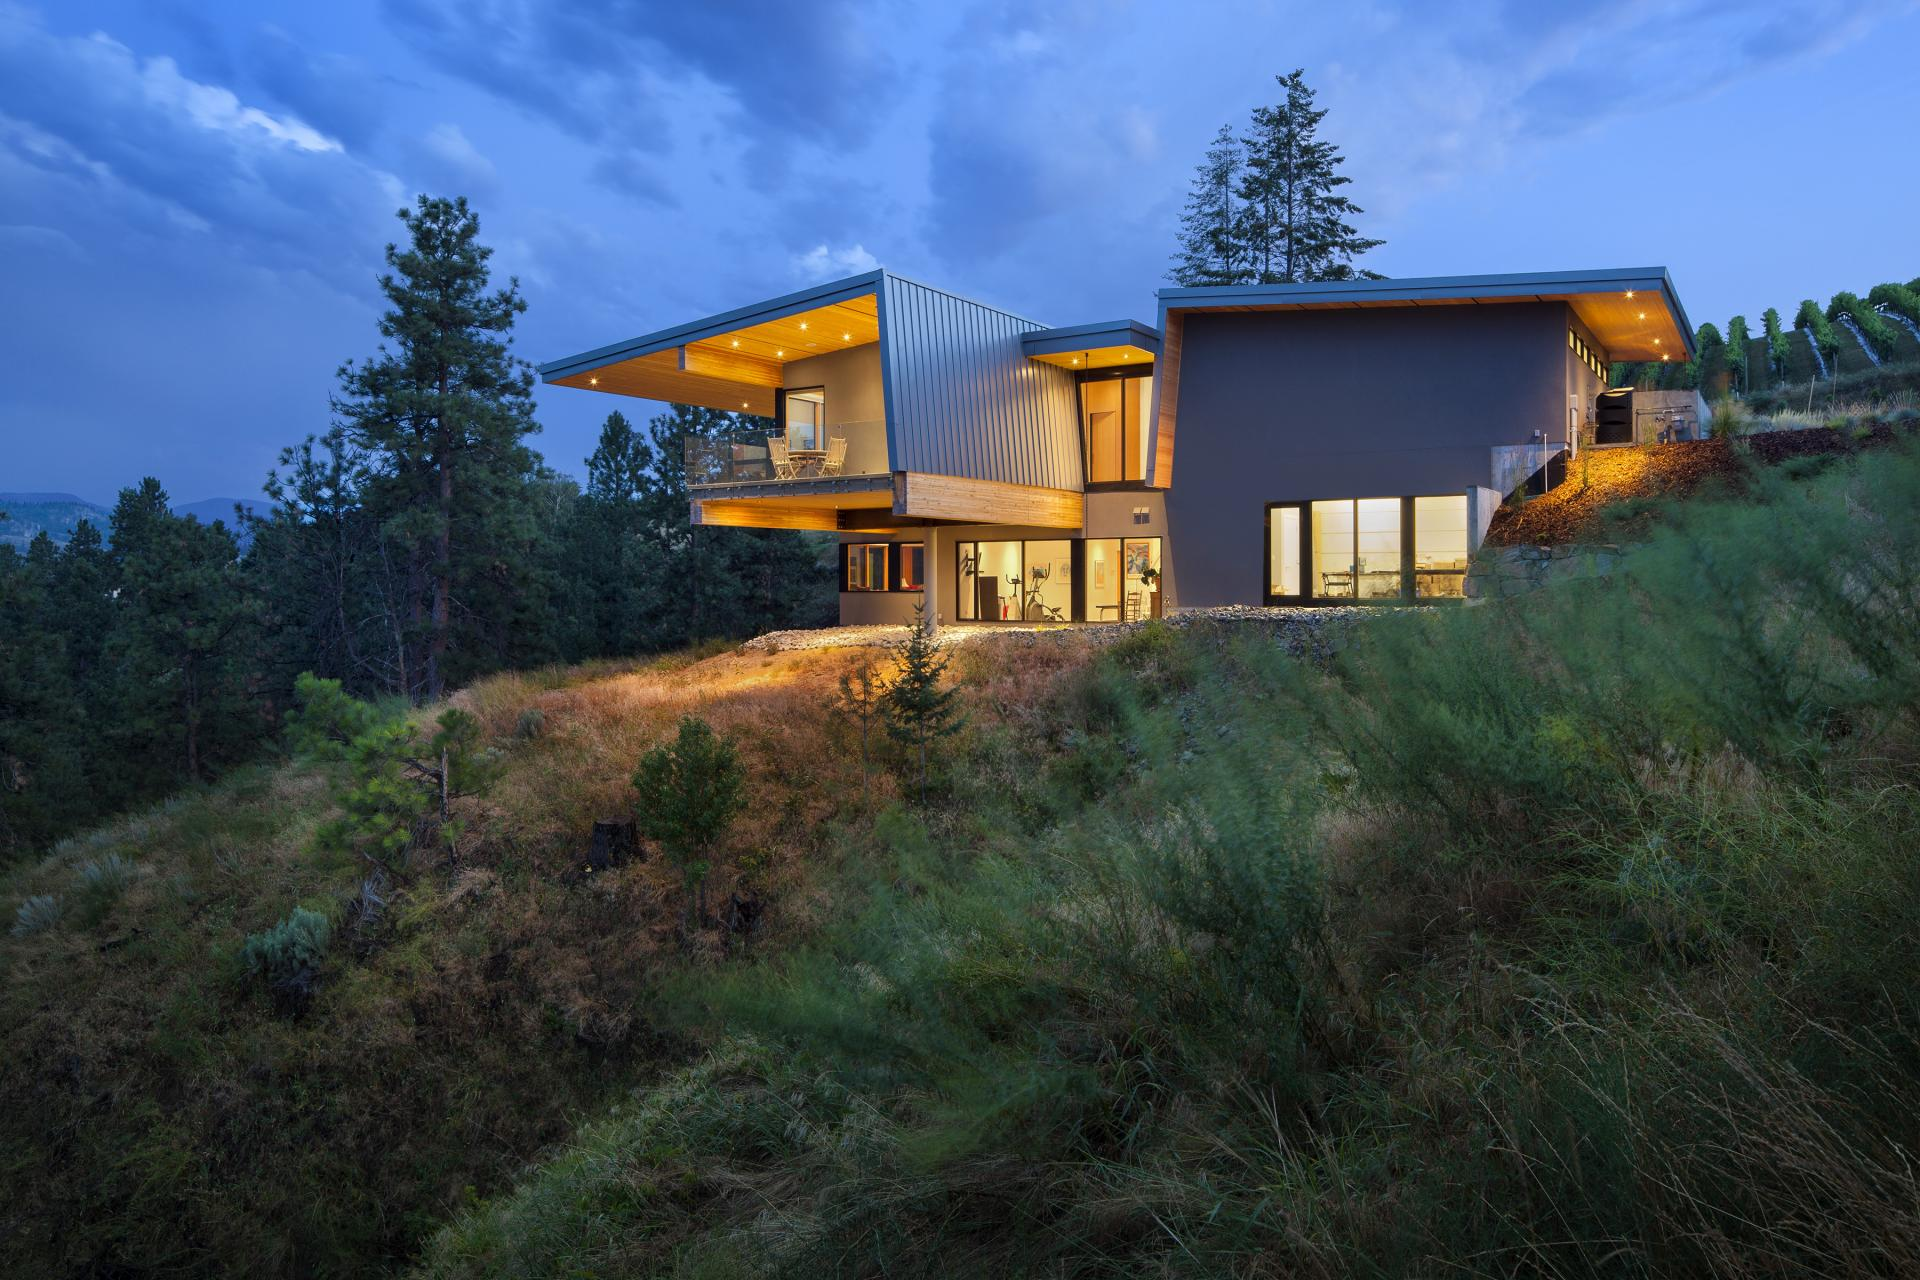 Lakeside Home in Kaleden, British Columbia